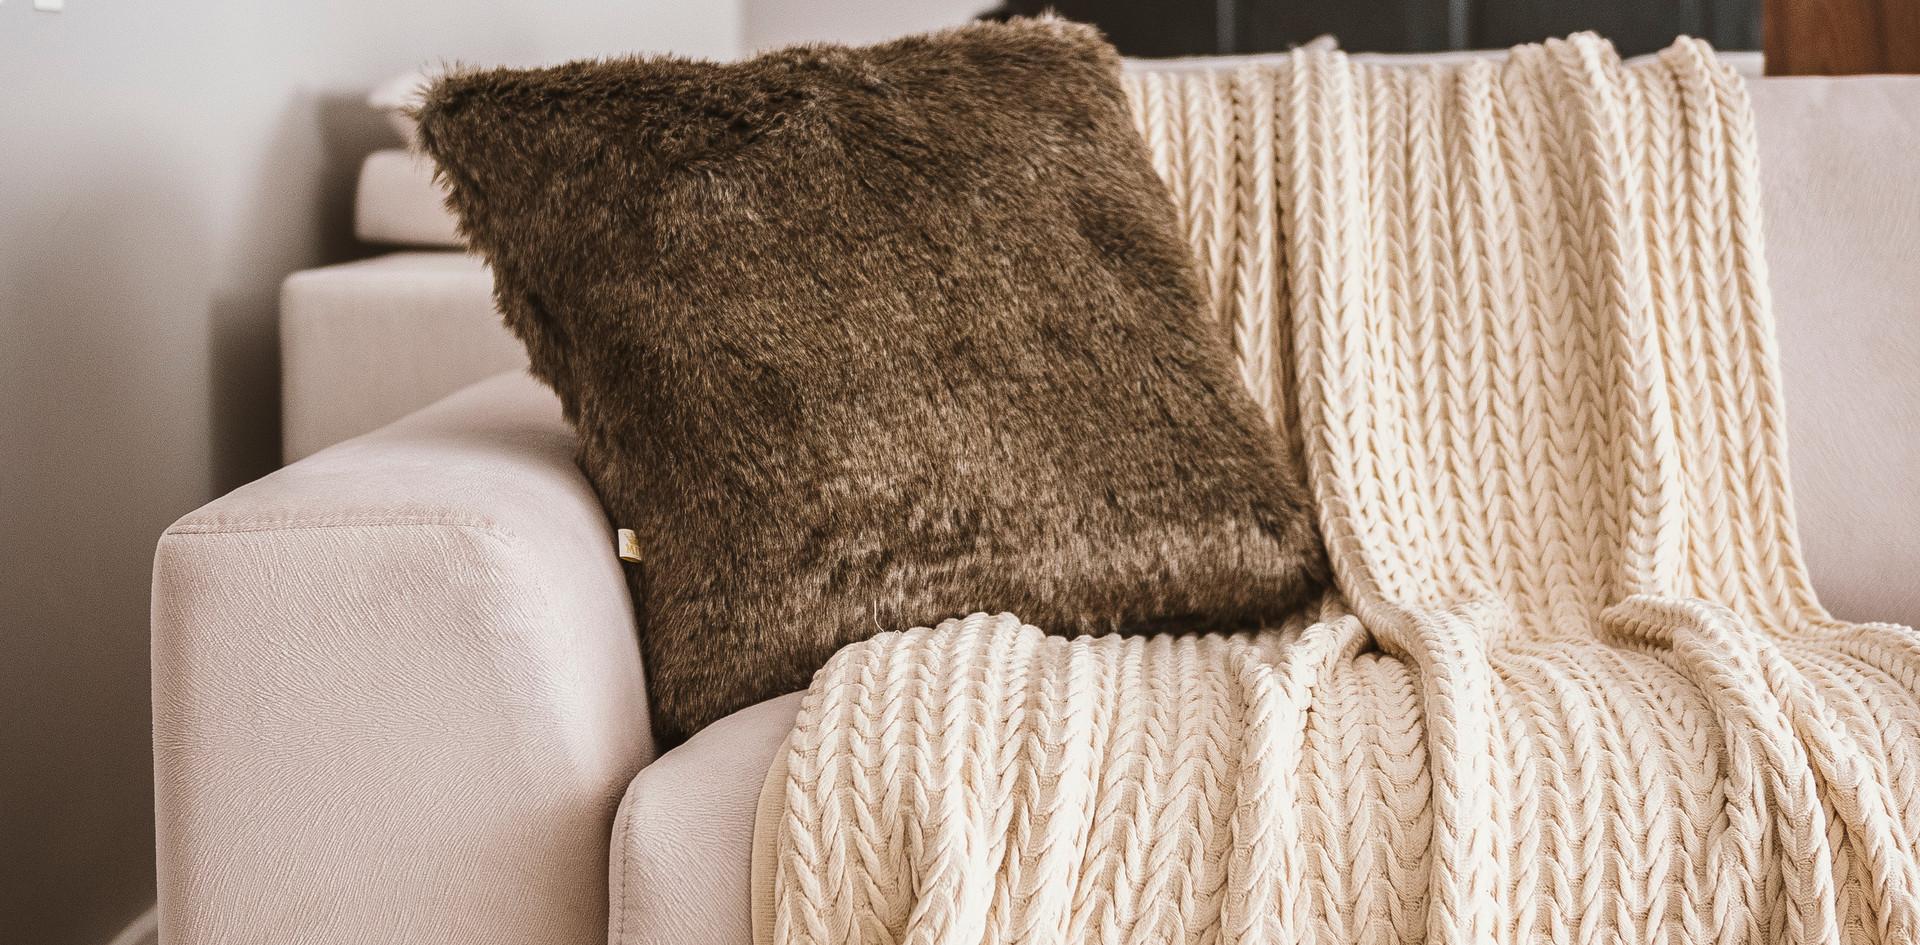 detalhes-sofa-cru-tricot-spazzio-design.